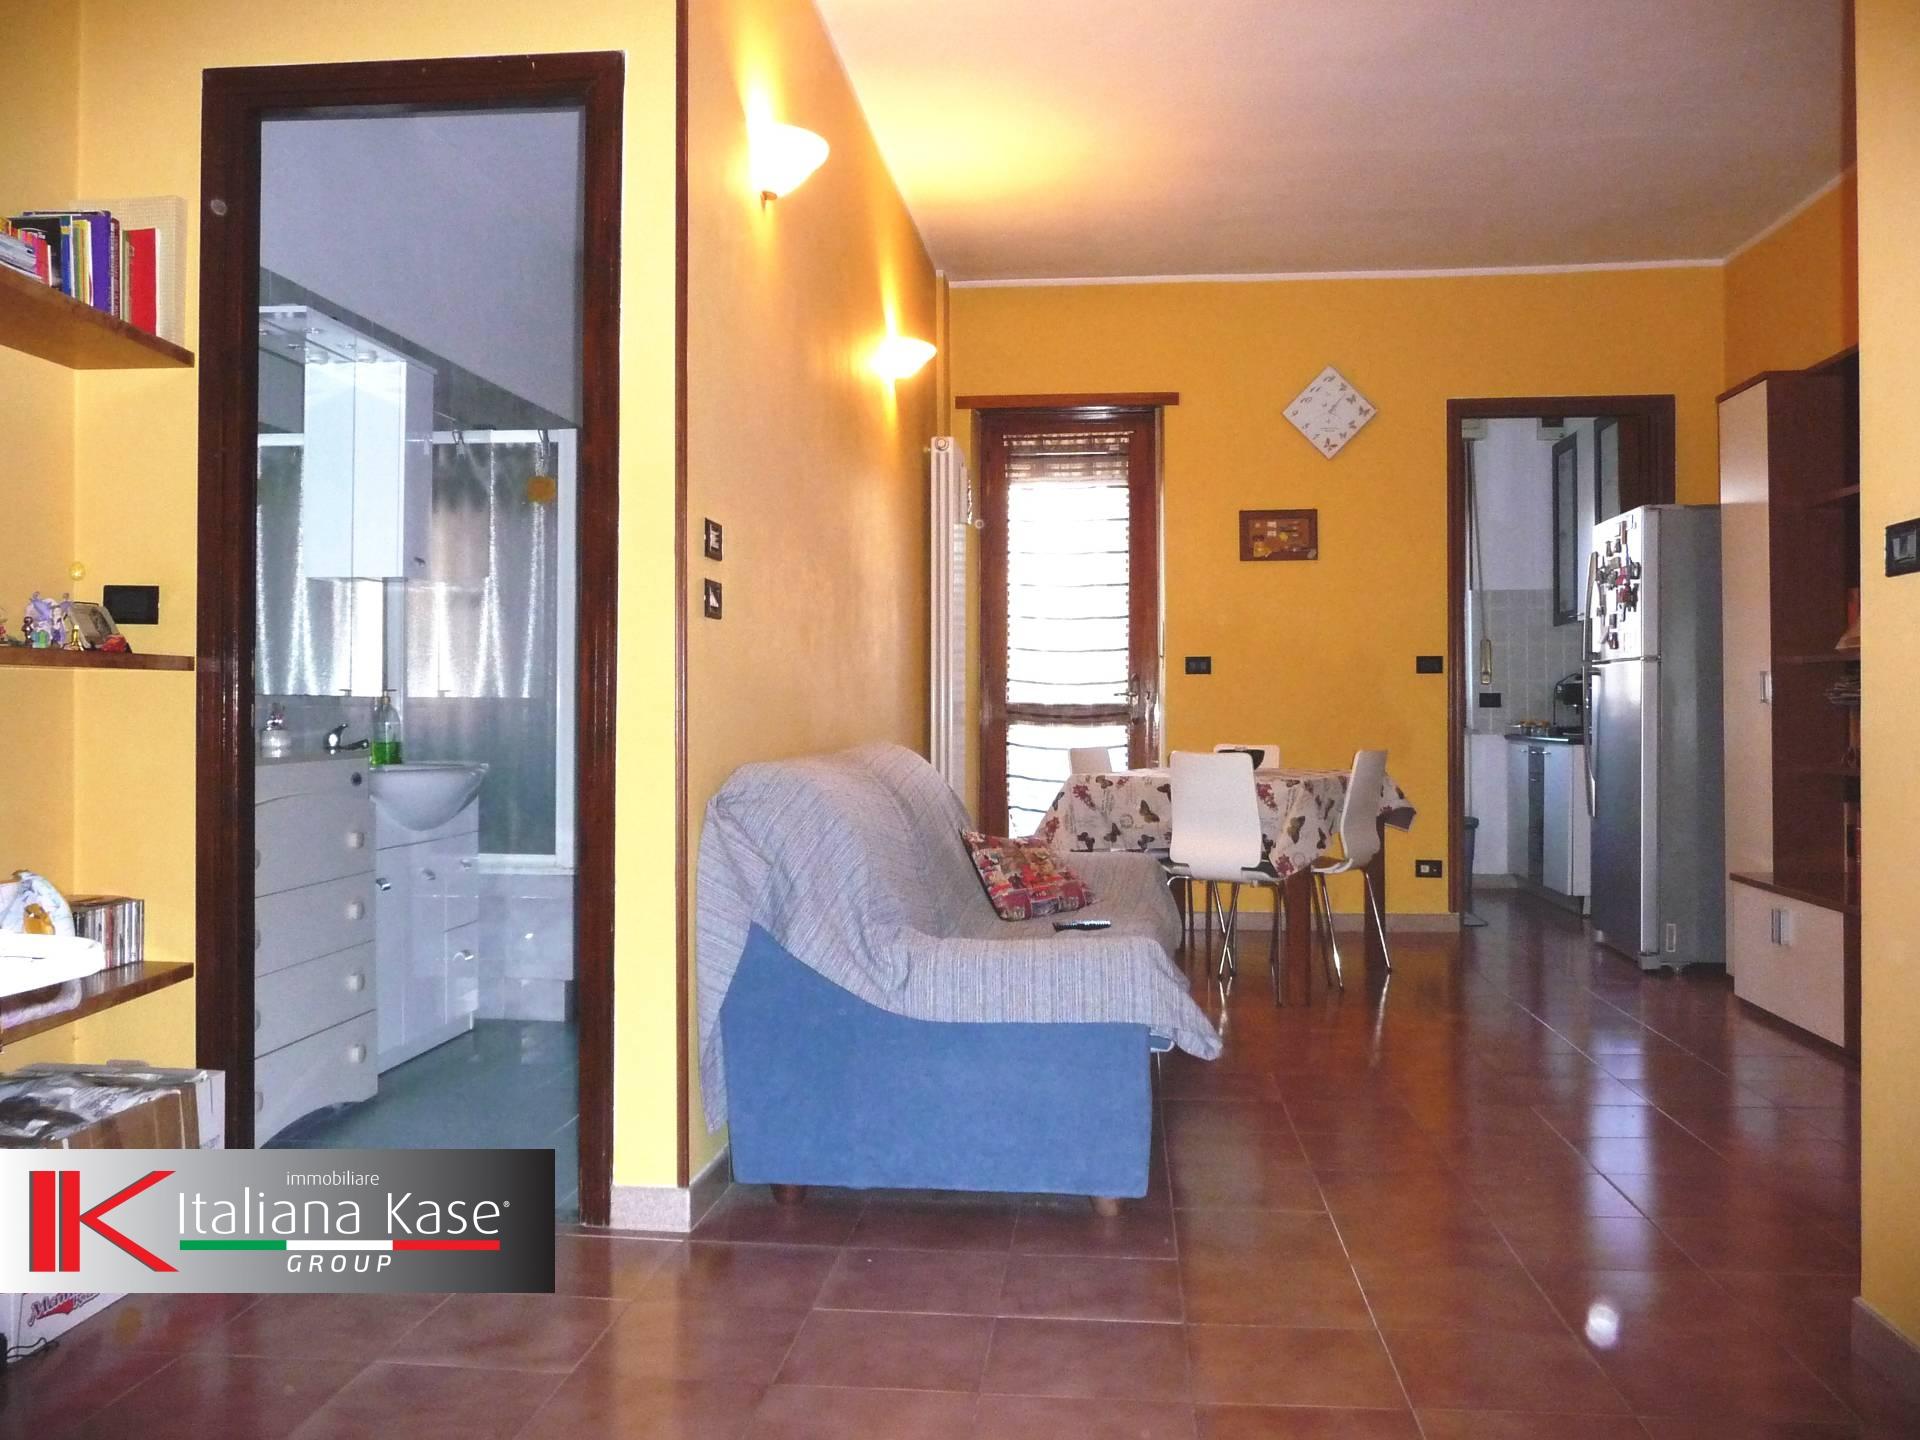 Bilocale Settimo Torinese Via Varese 3